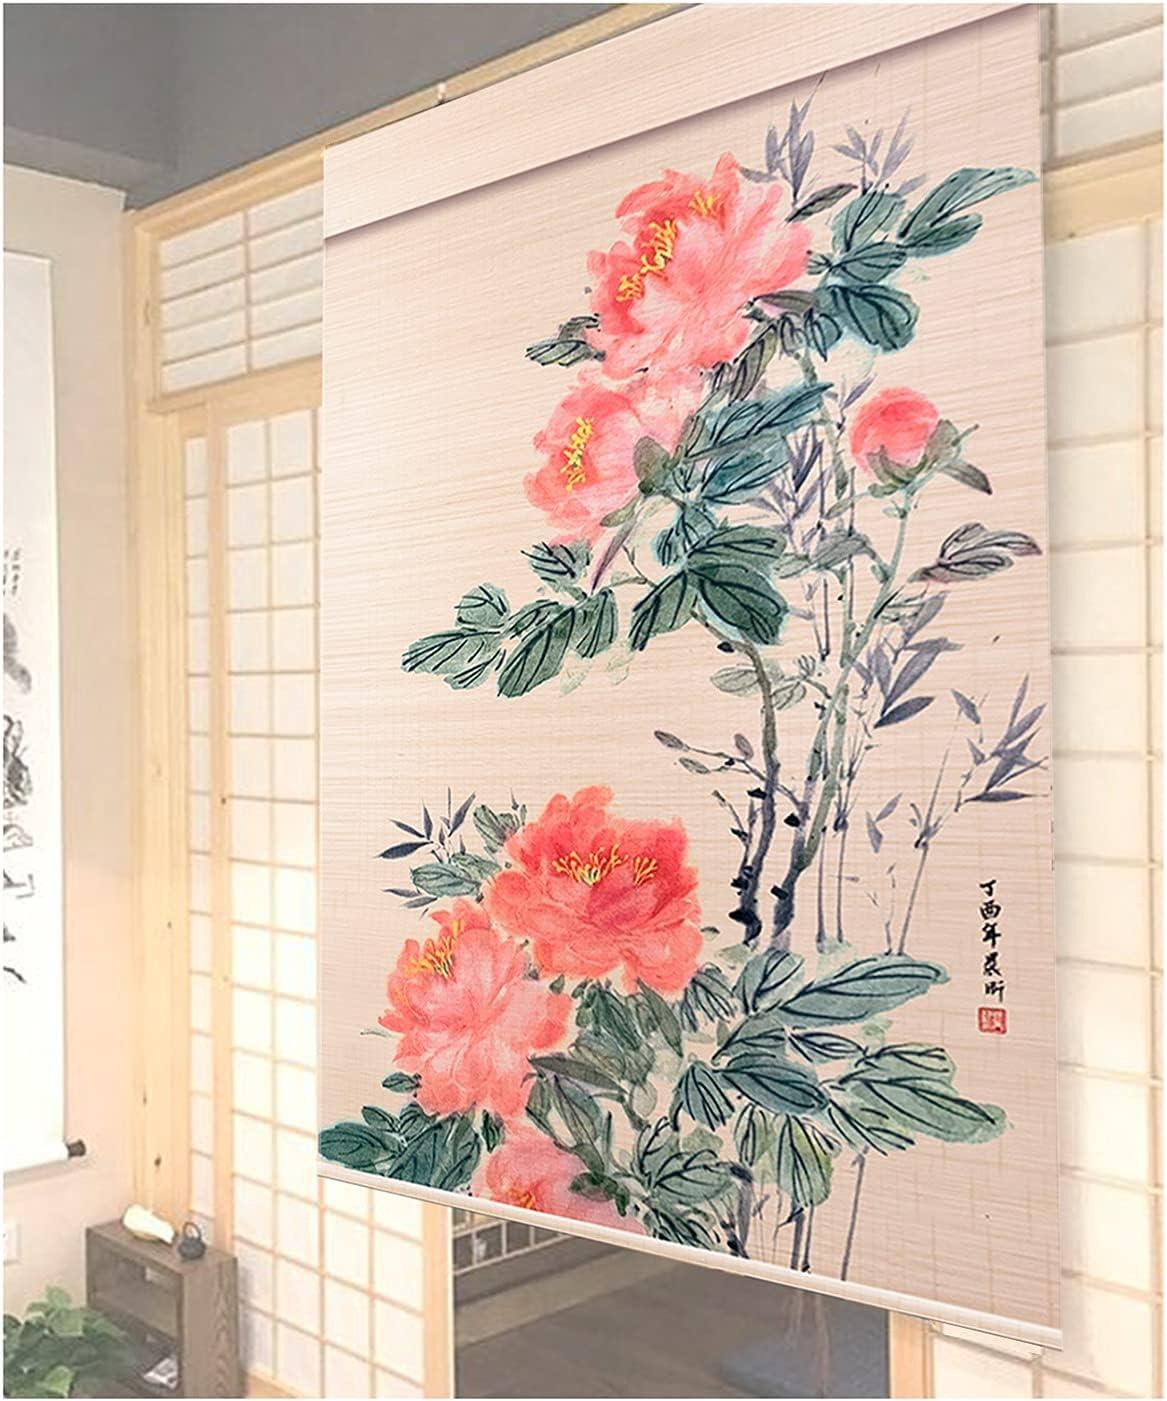 LIANGJUN Bamboo Curtain Roller Blind Ranking TOP6 Industry No. 1 Shades Window 3D Pat Roman